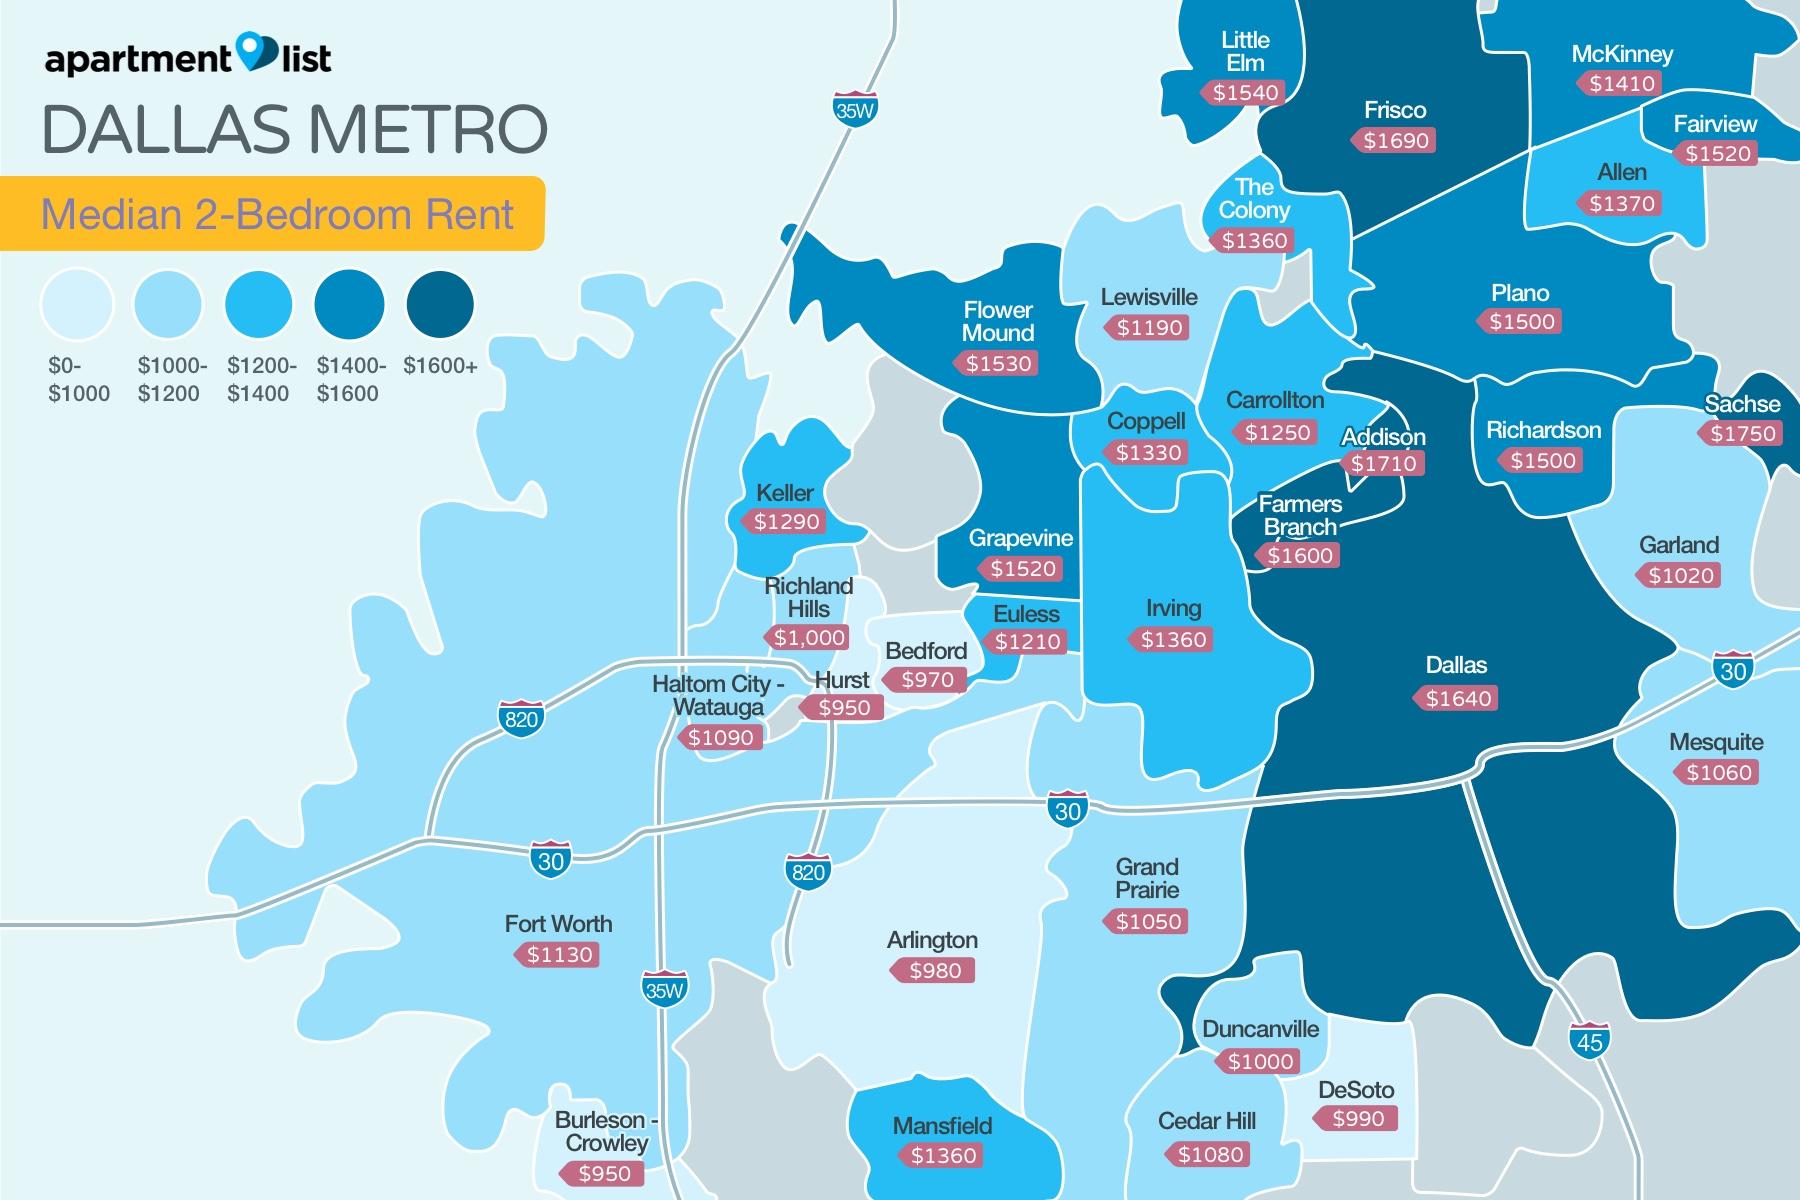 Dallas Metro Price Map